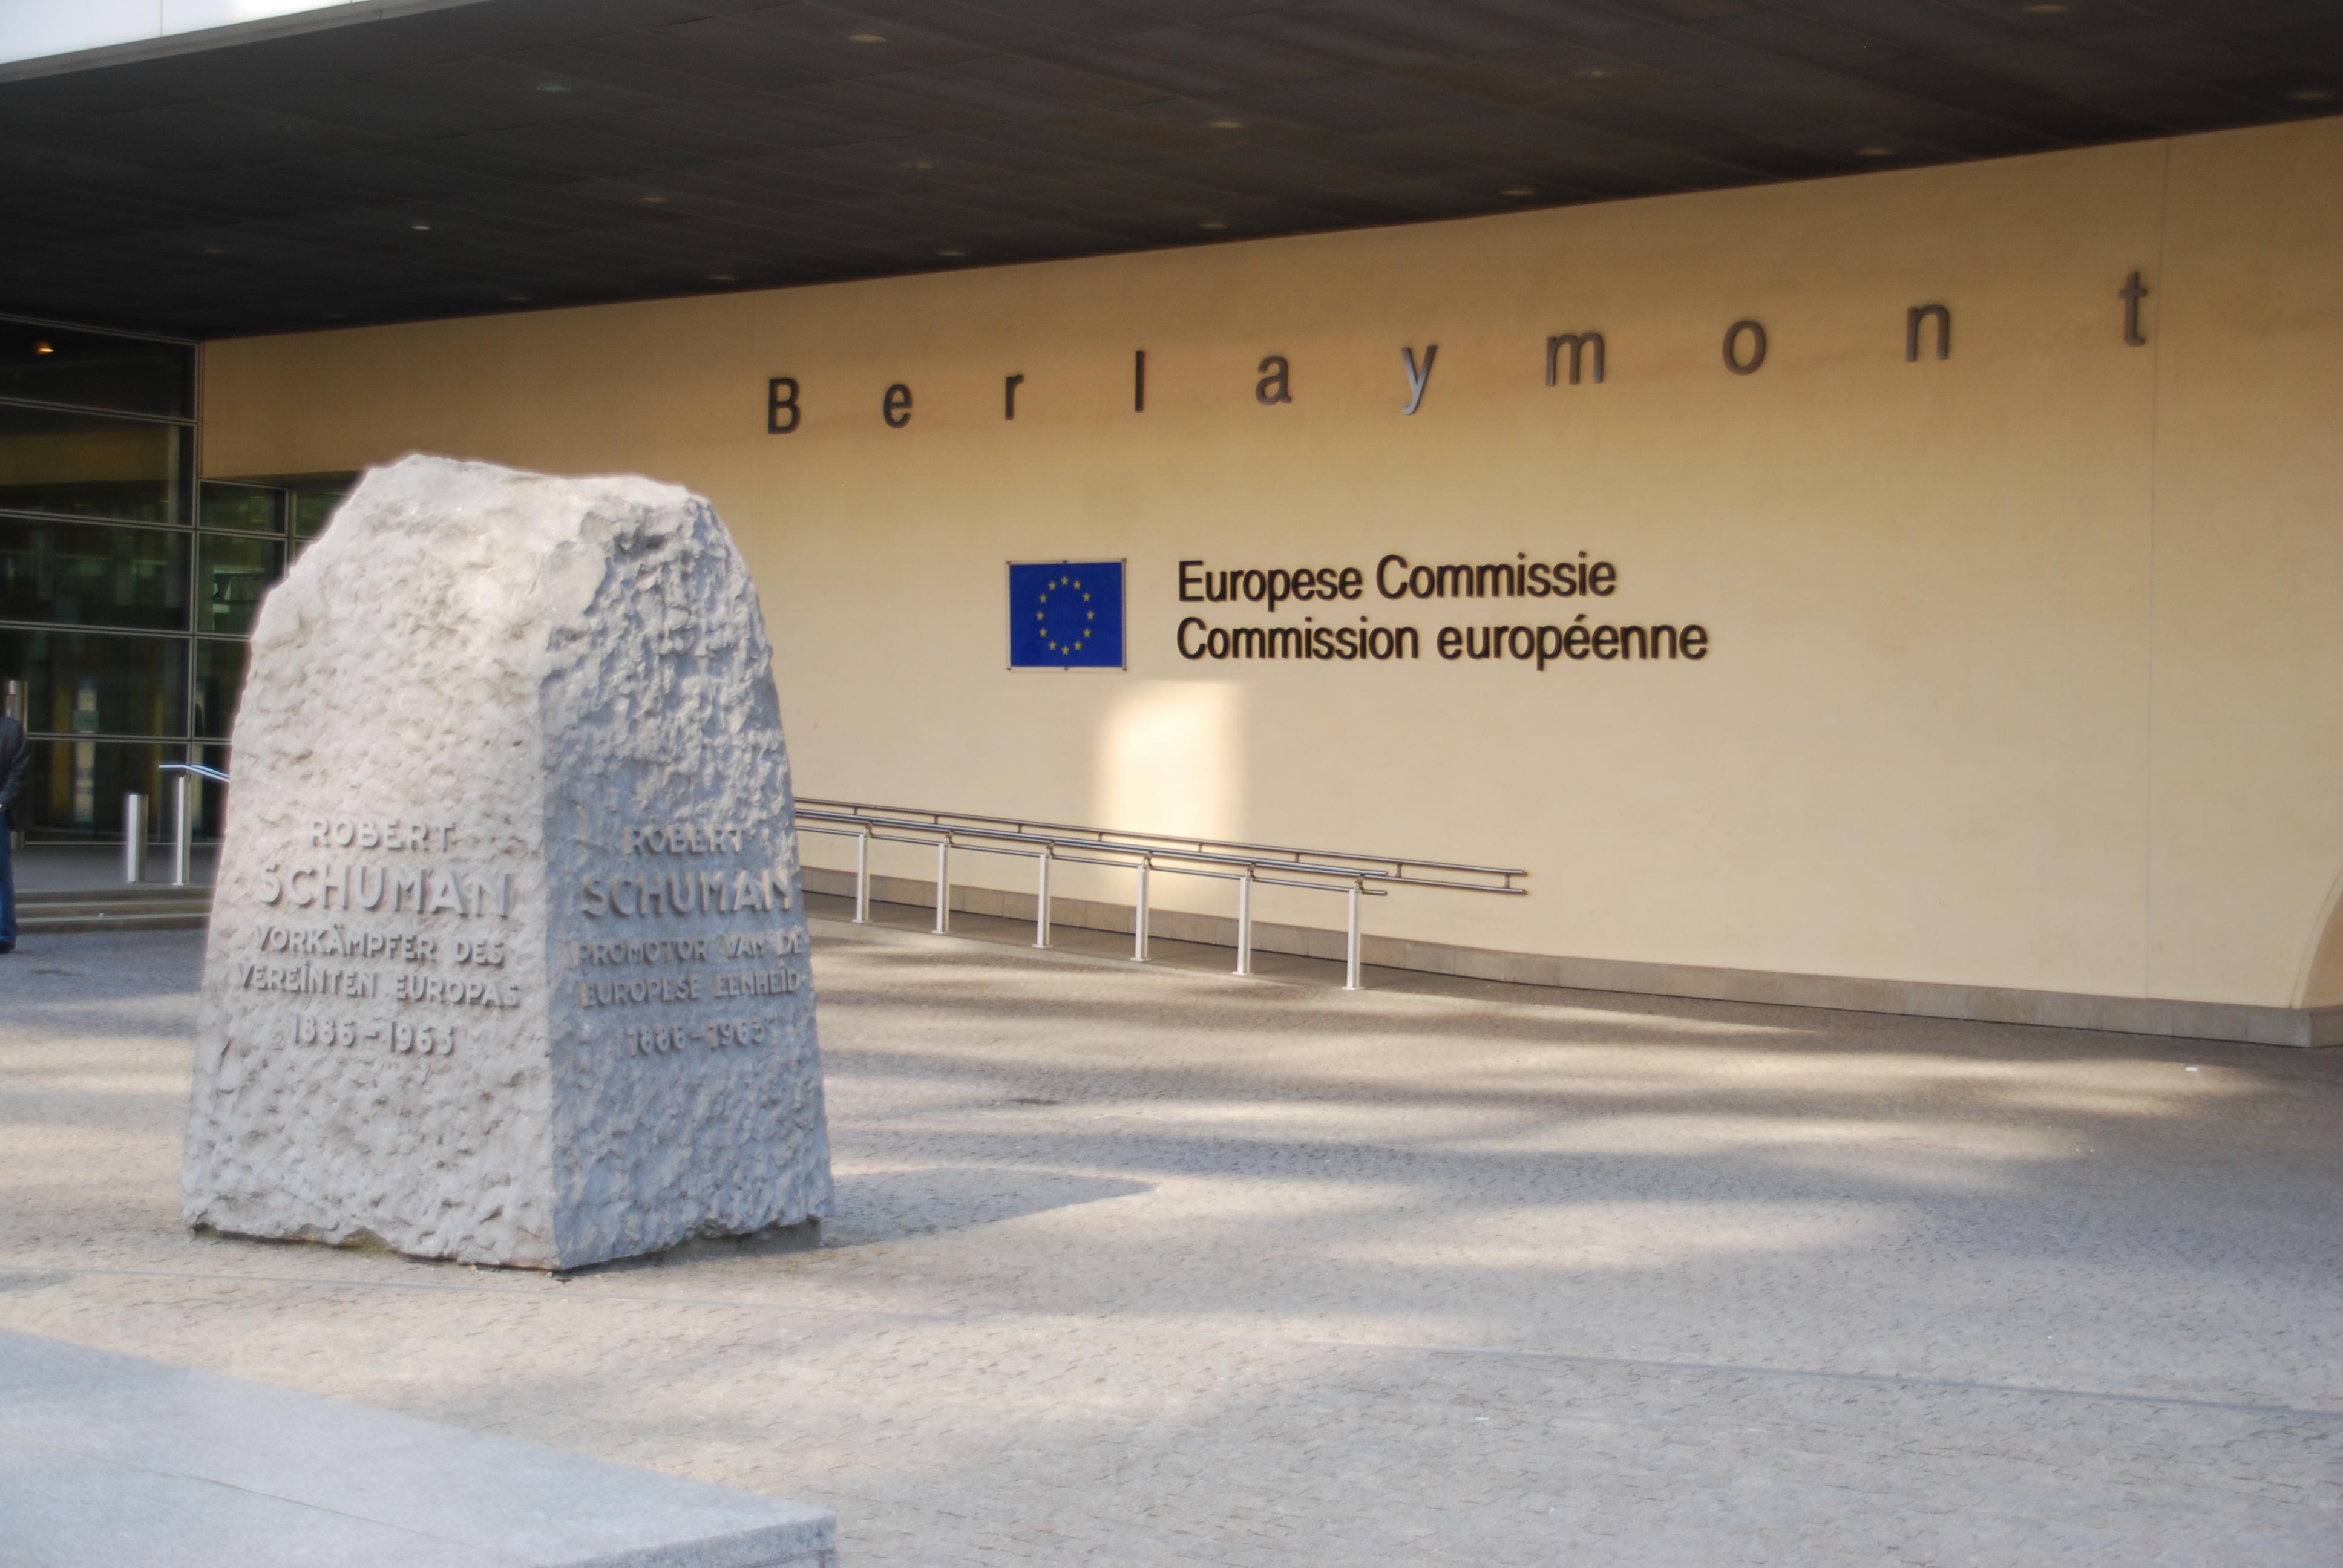 Commissione europea - Photo credit: Matthias v.d. Elbe